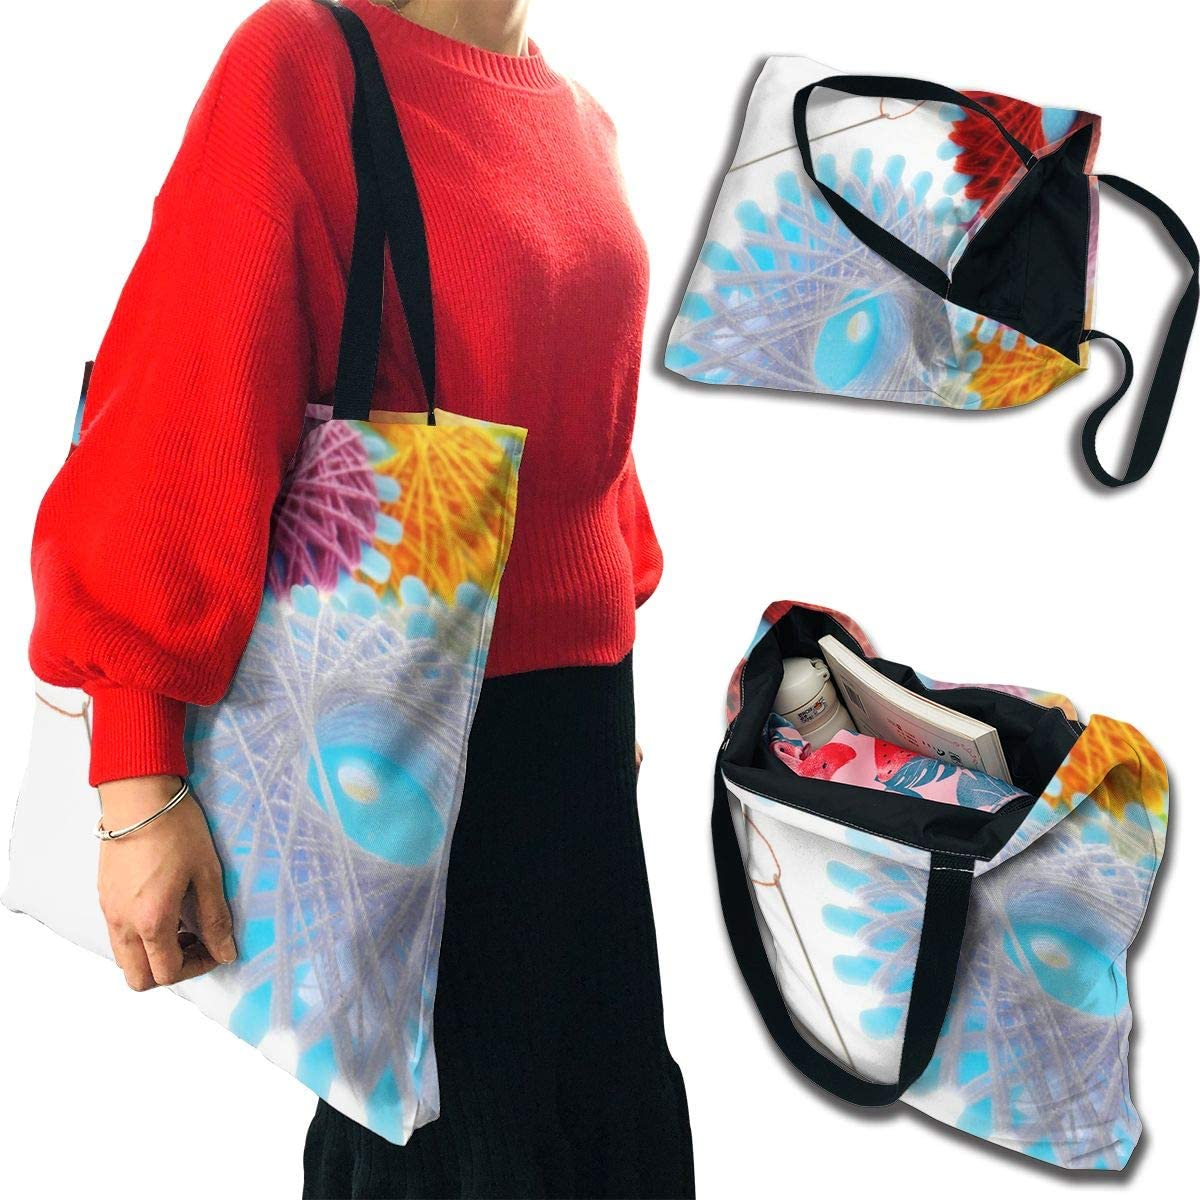 PengMin Creative Needle Flower Color Fashion Fashion Womens Multi-Pocket Vintage Canvas Handbags Miniature Shoulder Bags Totes Purses Shopping Bags